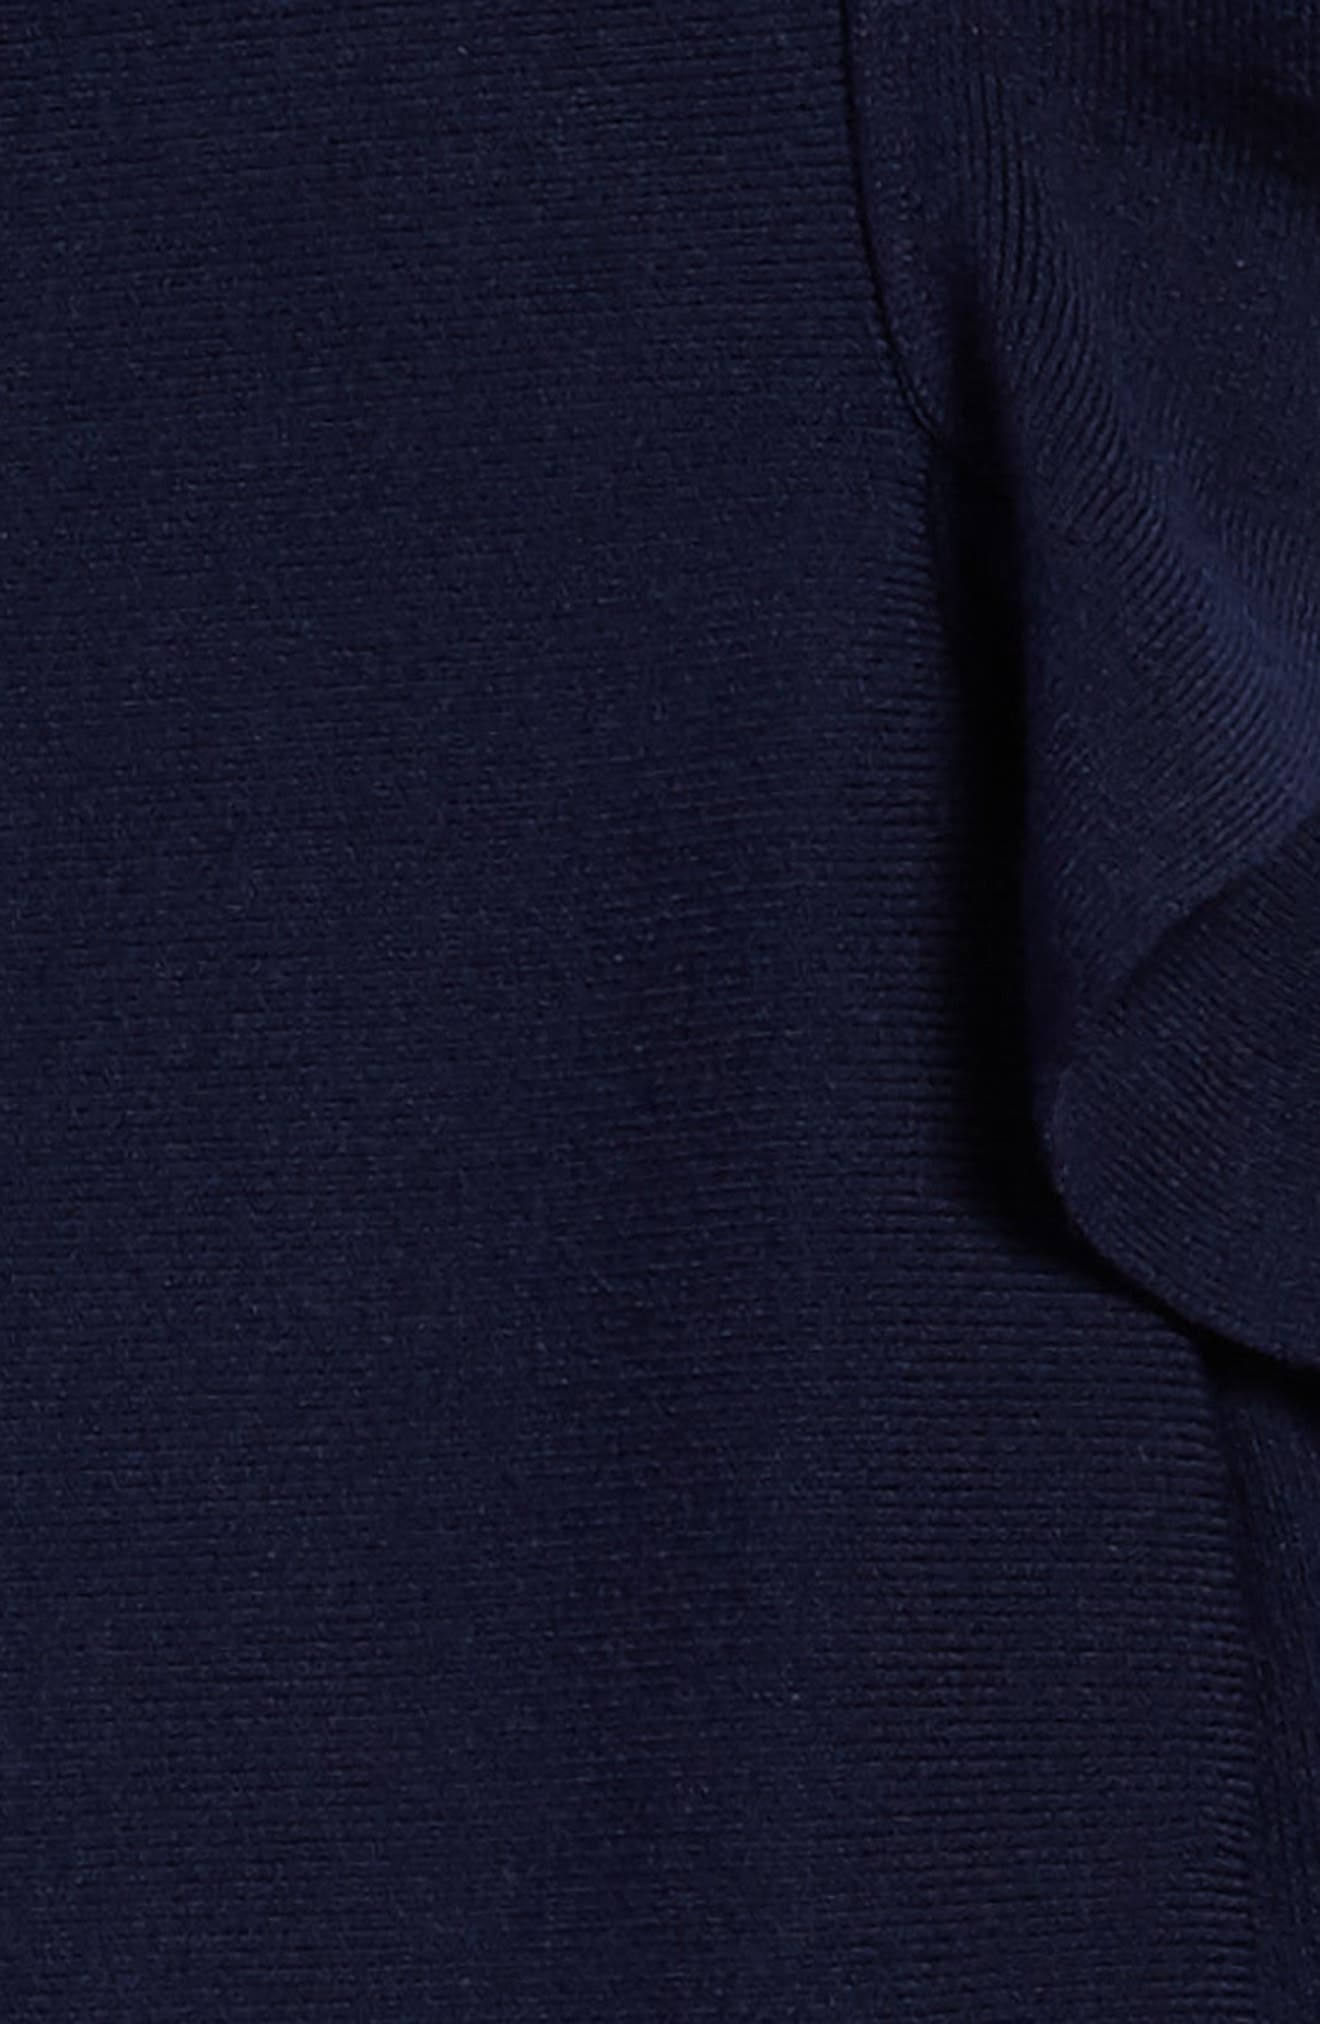 MILLY MINIS,                             Cold Shoulder Skater Dress,                             Alternate thumbnail 3, color,                             410